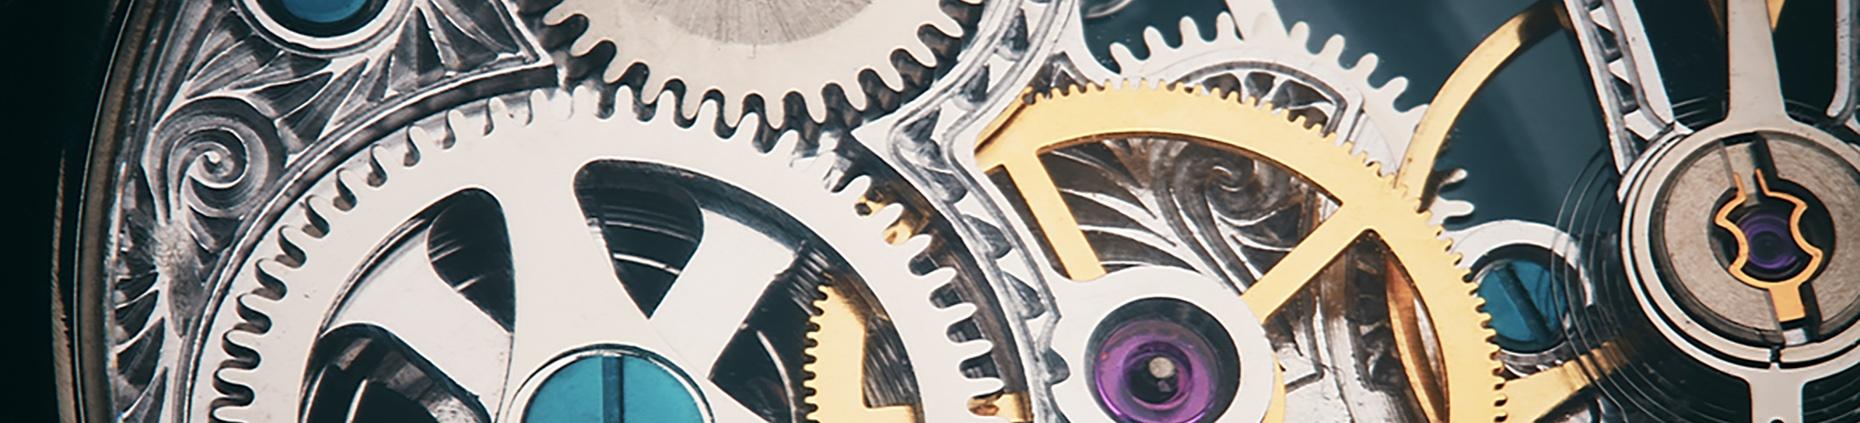 The Extreme Productivity System: Keys, Habits, and Hacks